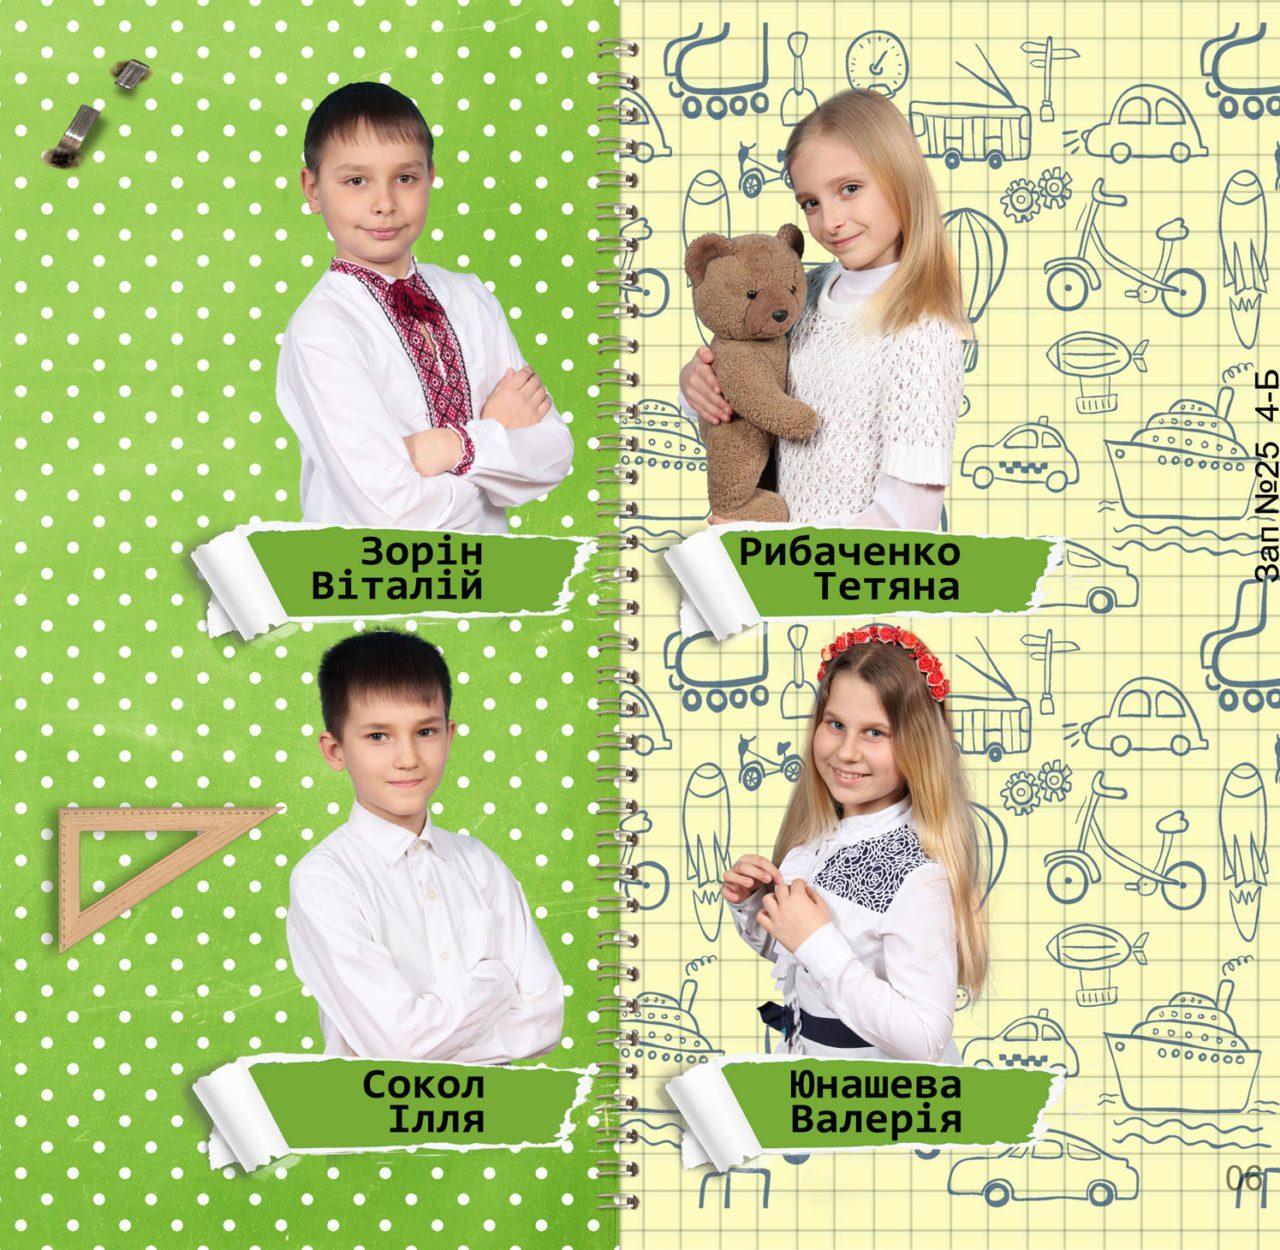 https://school-photo.com.ua/wp-content/uploads/2017/07/06-5-1280x1250.jpg